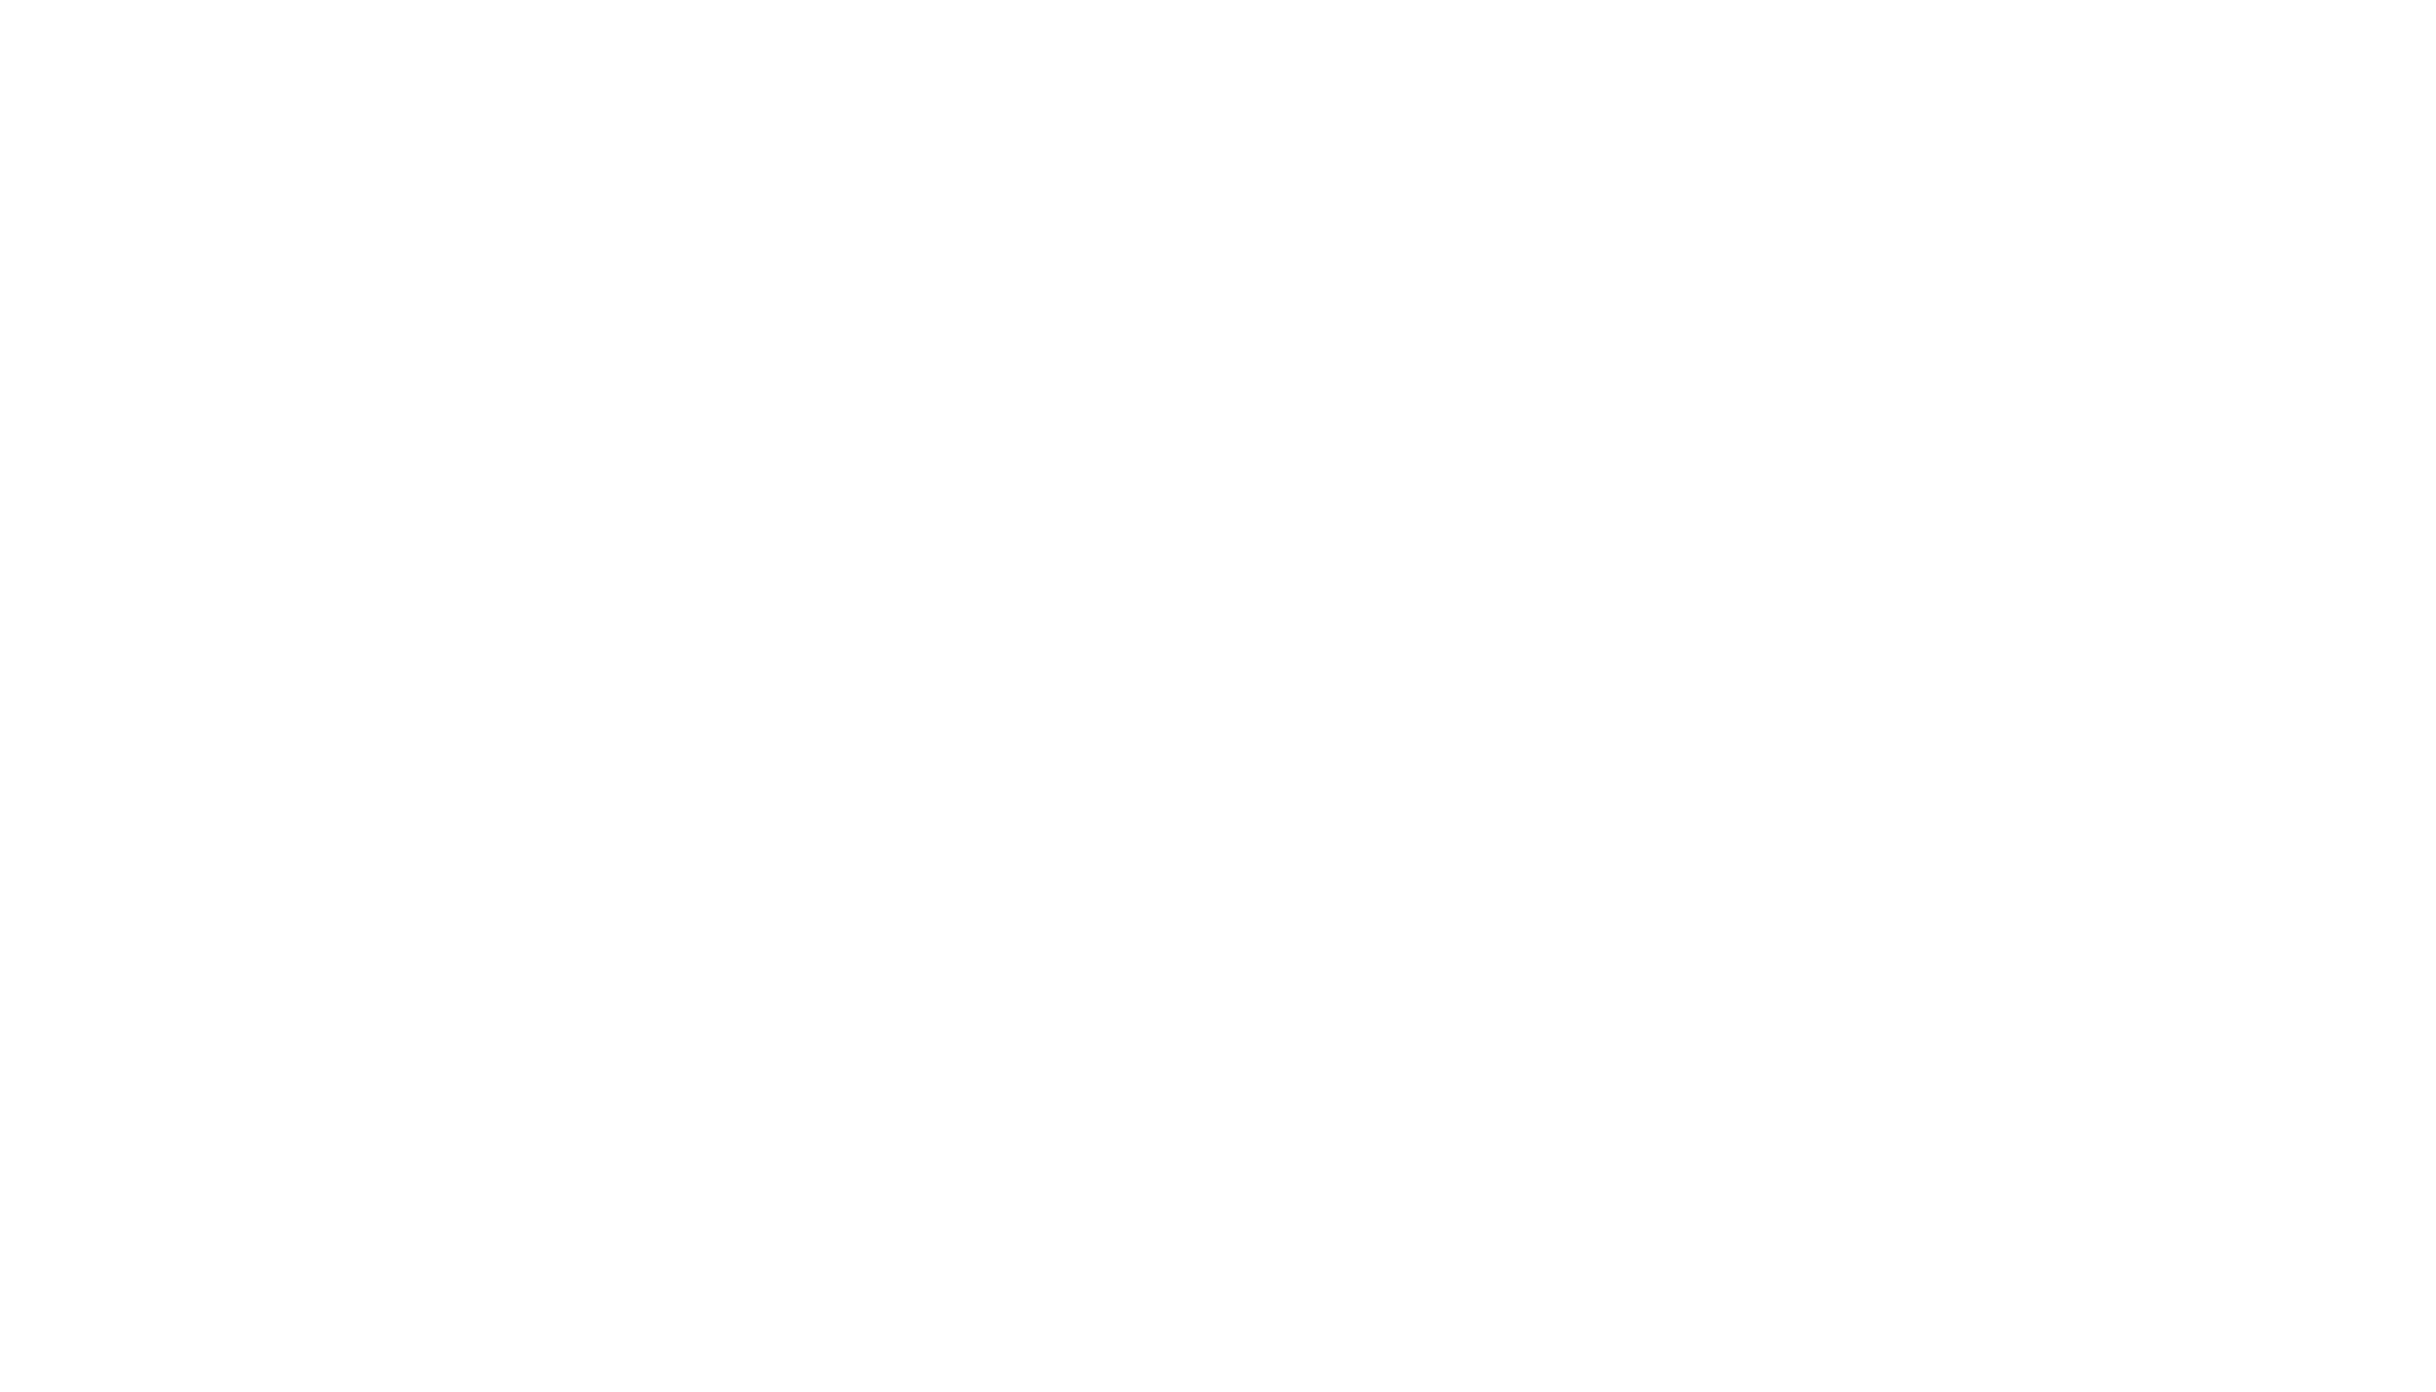 WBNH Southern Gospel (WBNH-SG)